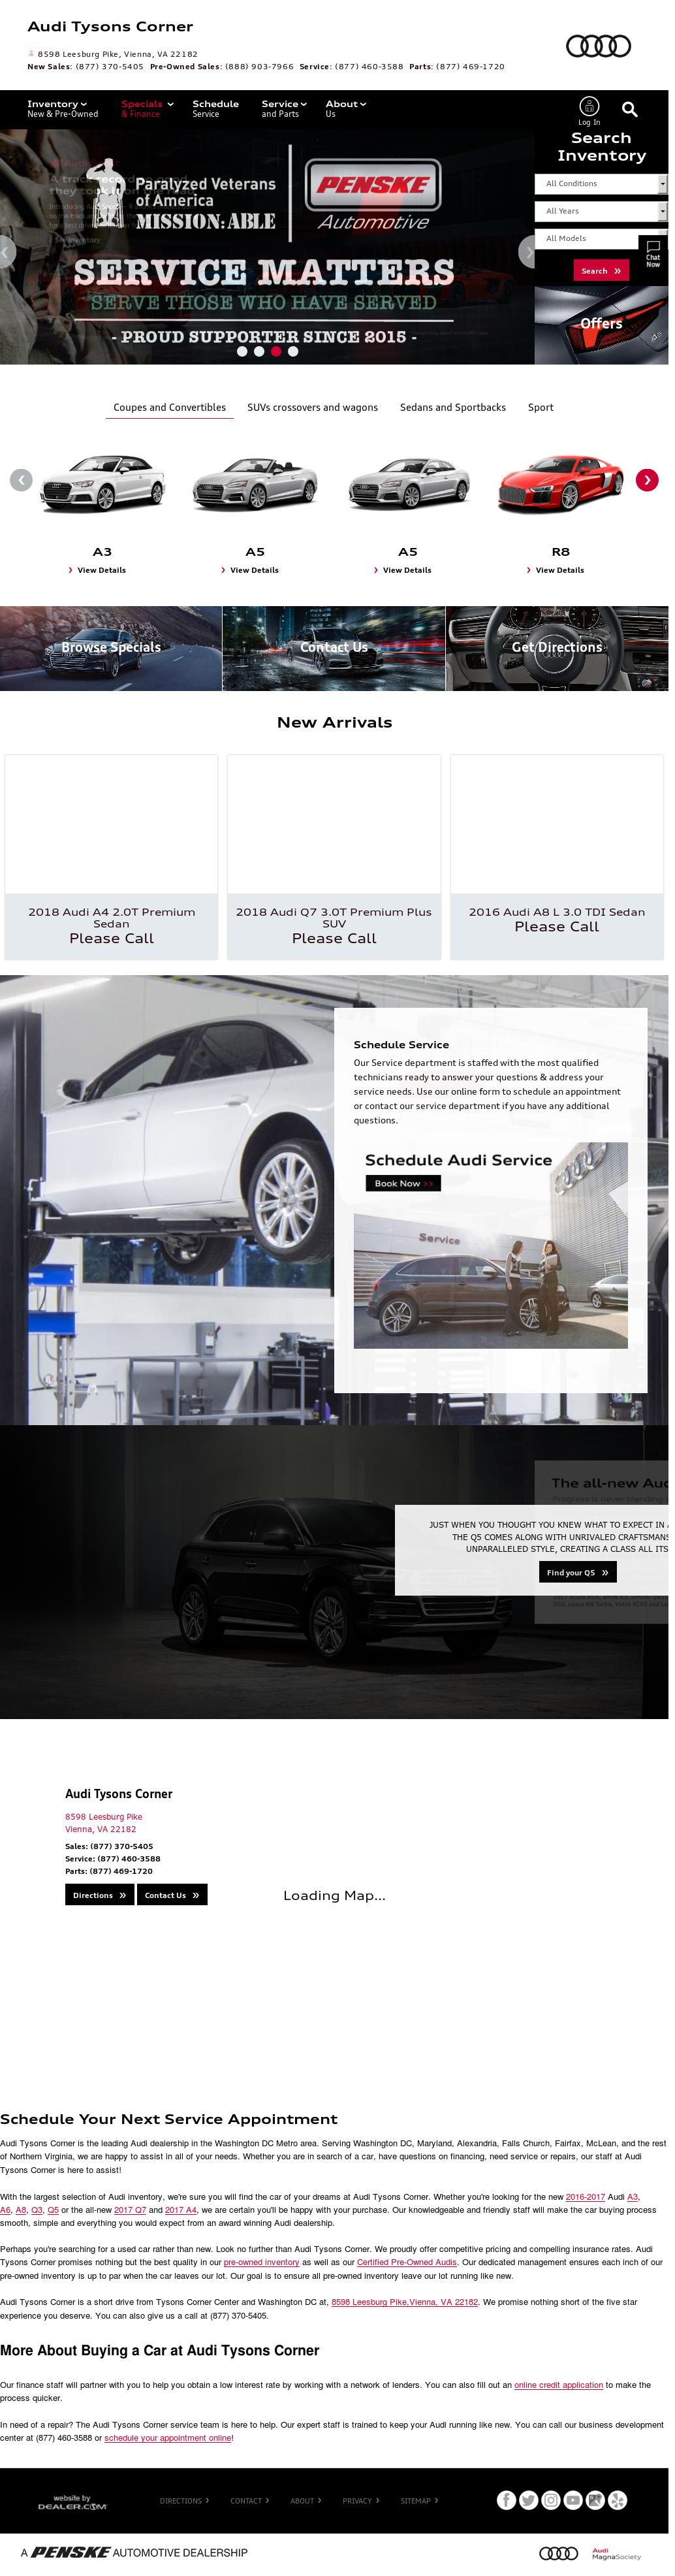 Audi Tysons Service Hours The Audi Car - Audi tysons